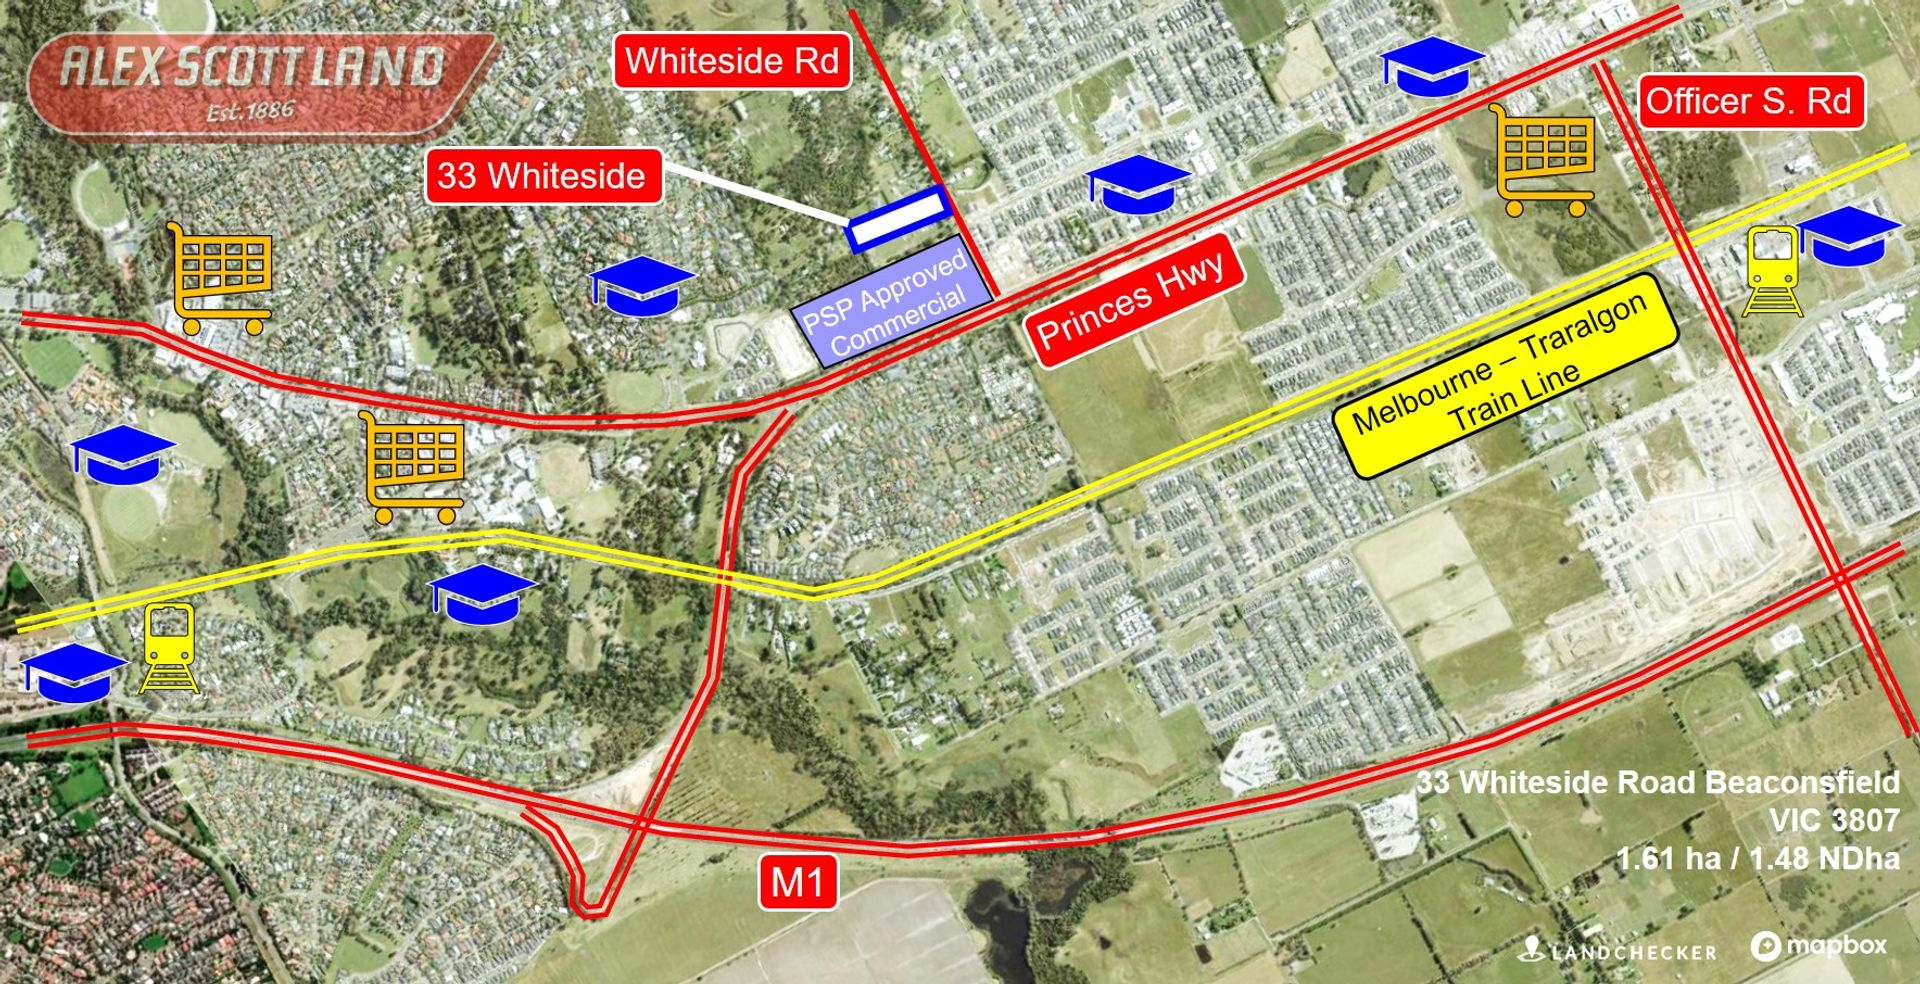 33 WHITESIDE Road, Beaconsfield, VIC  3807